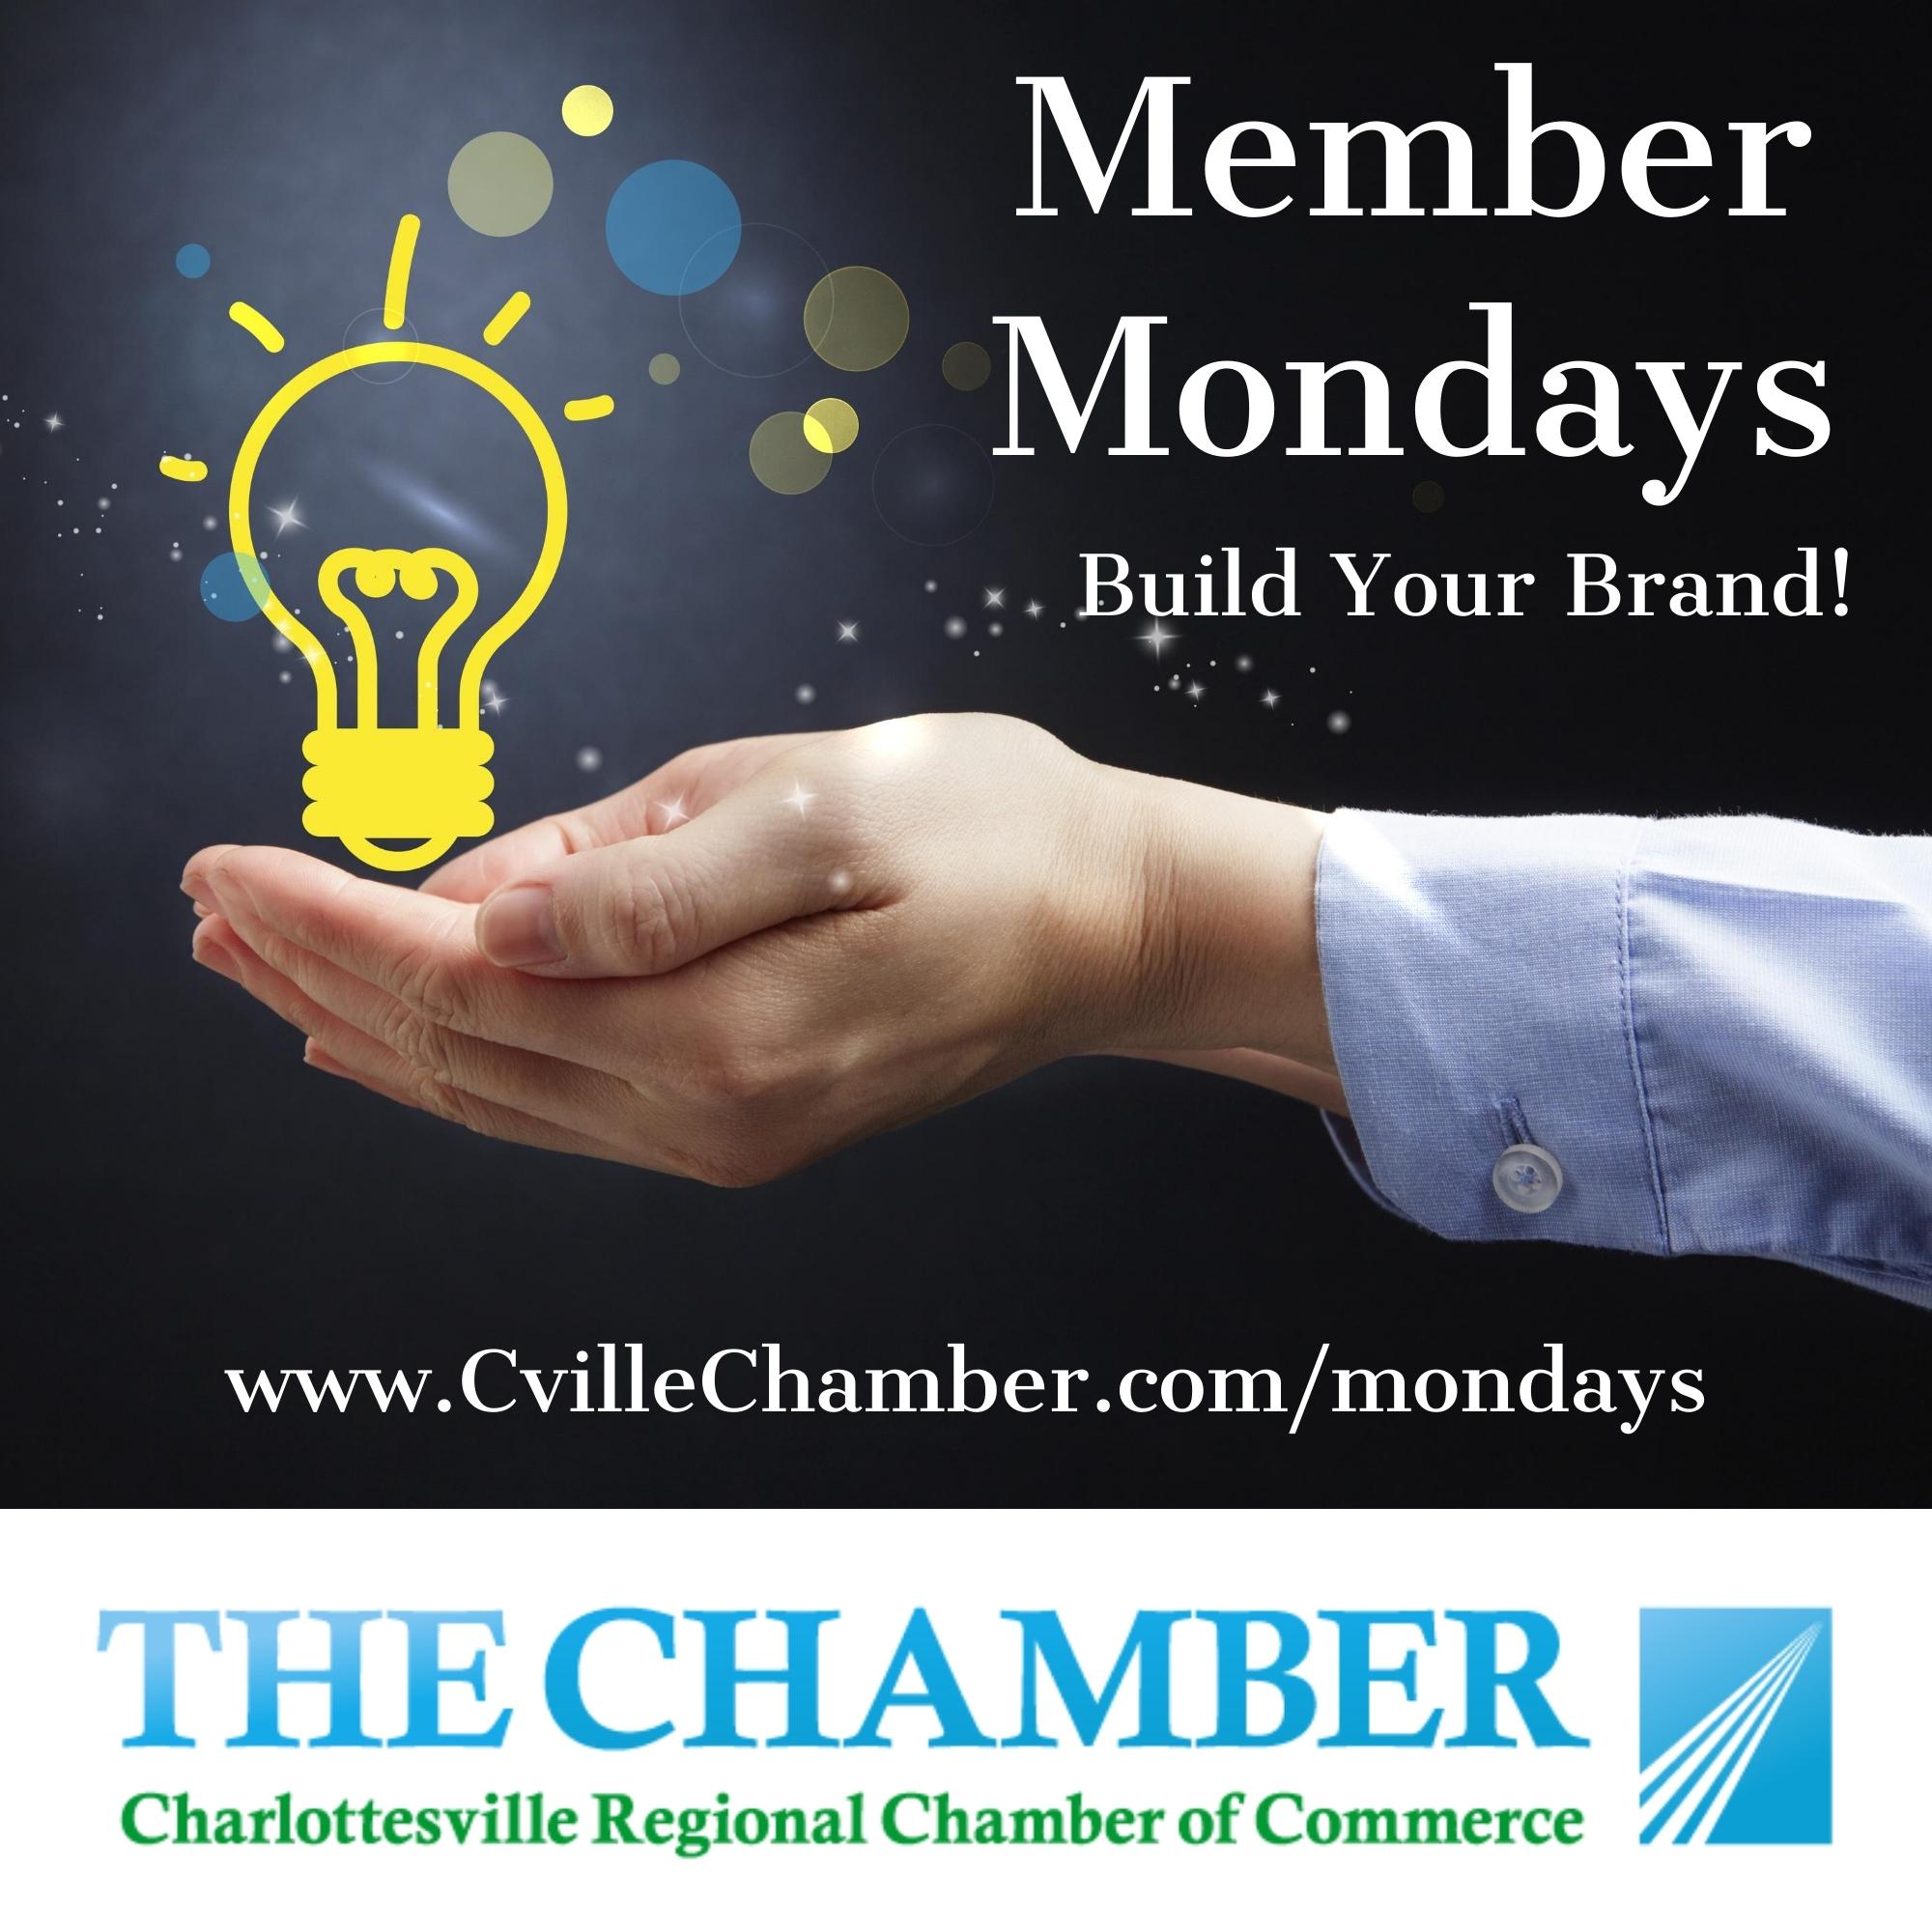 Copy of Member Mondays